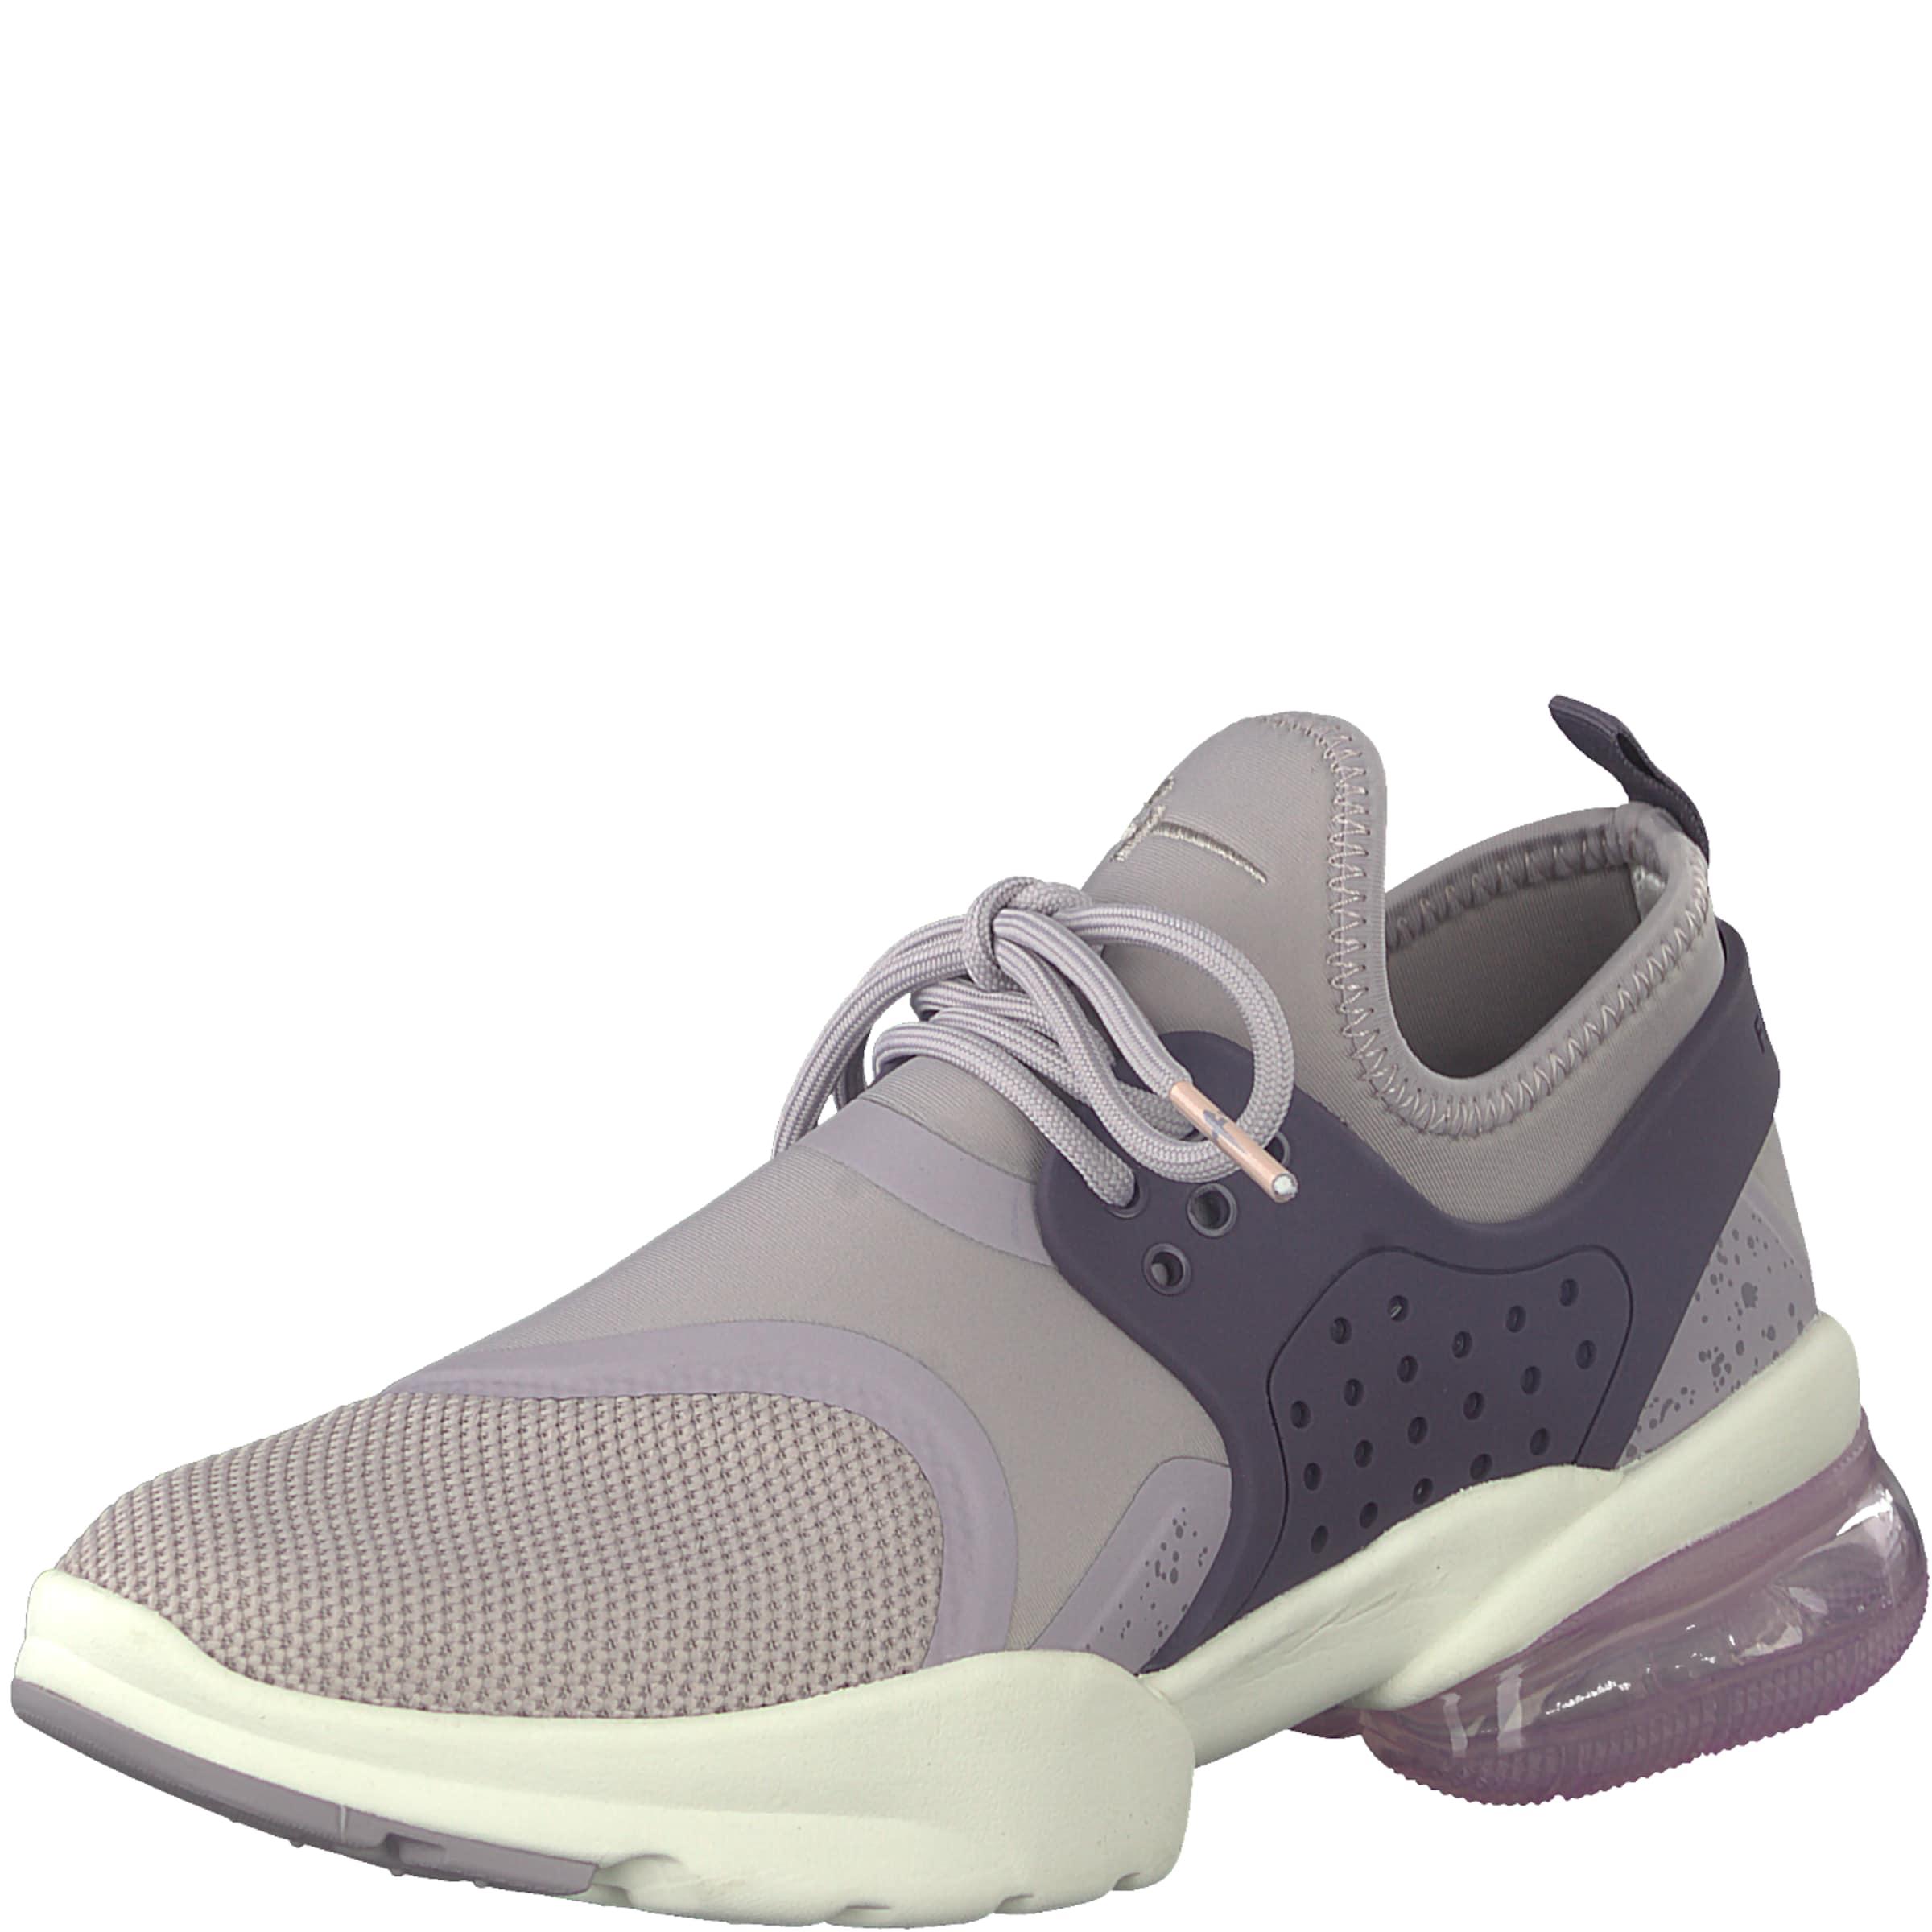 Haltbare Mode billige Schuhe TAMARIS | Sneaker 'Fashletics' Schuhe Gut getragene Schuhe